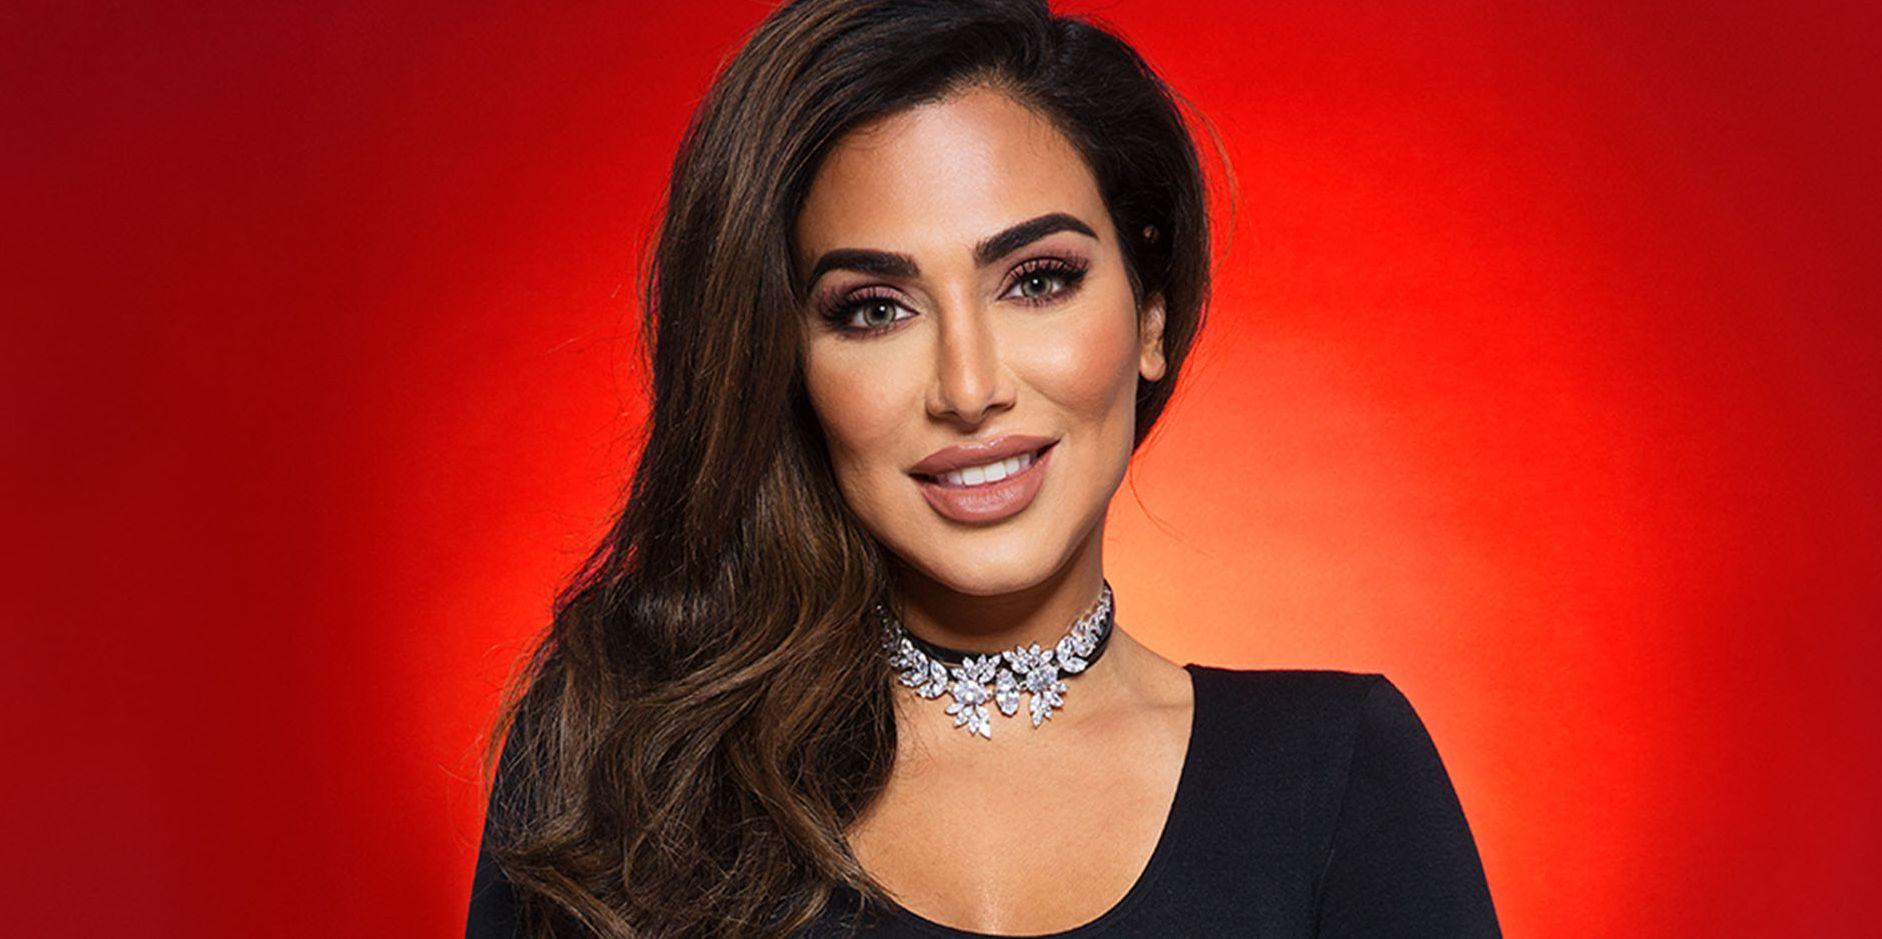 Huda Kattan spends more than $4,000 a month on makeup